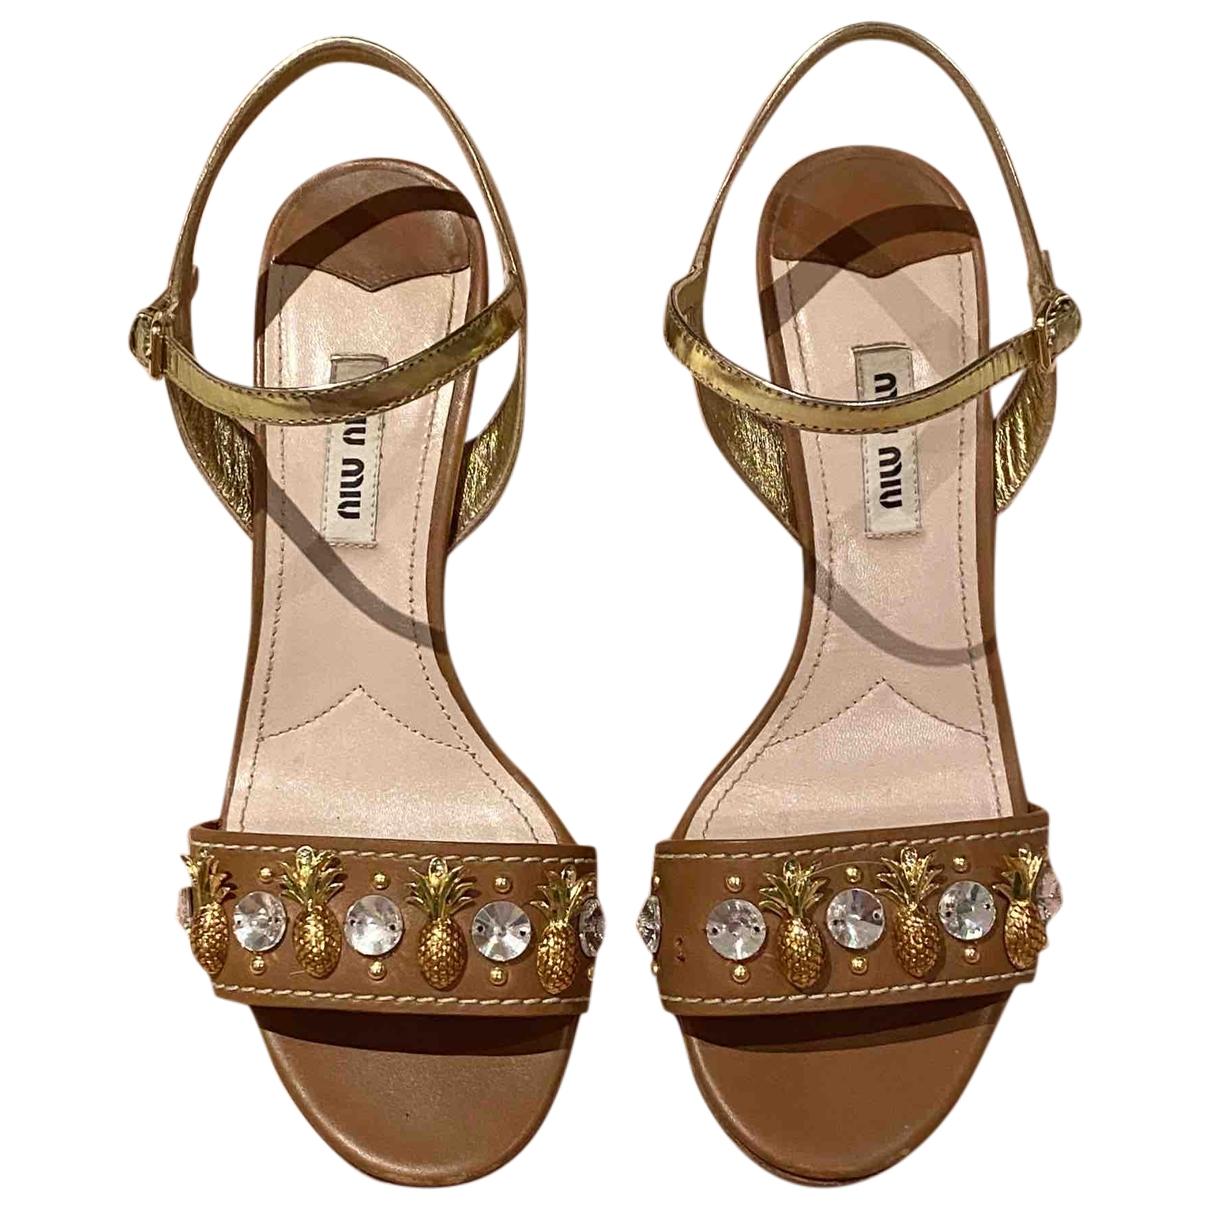 Miu Miu \N Brown Leather Sandals for Women 36 IT